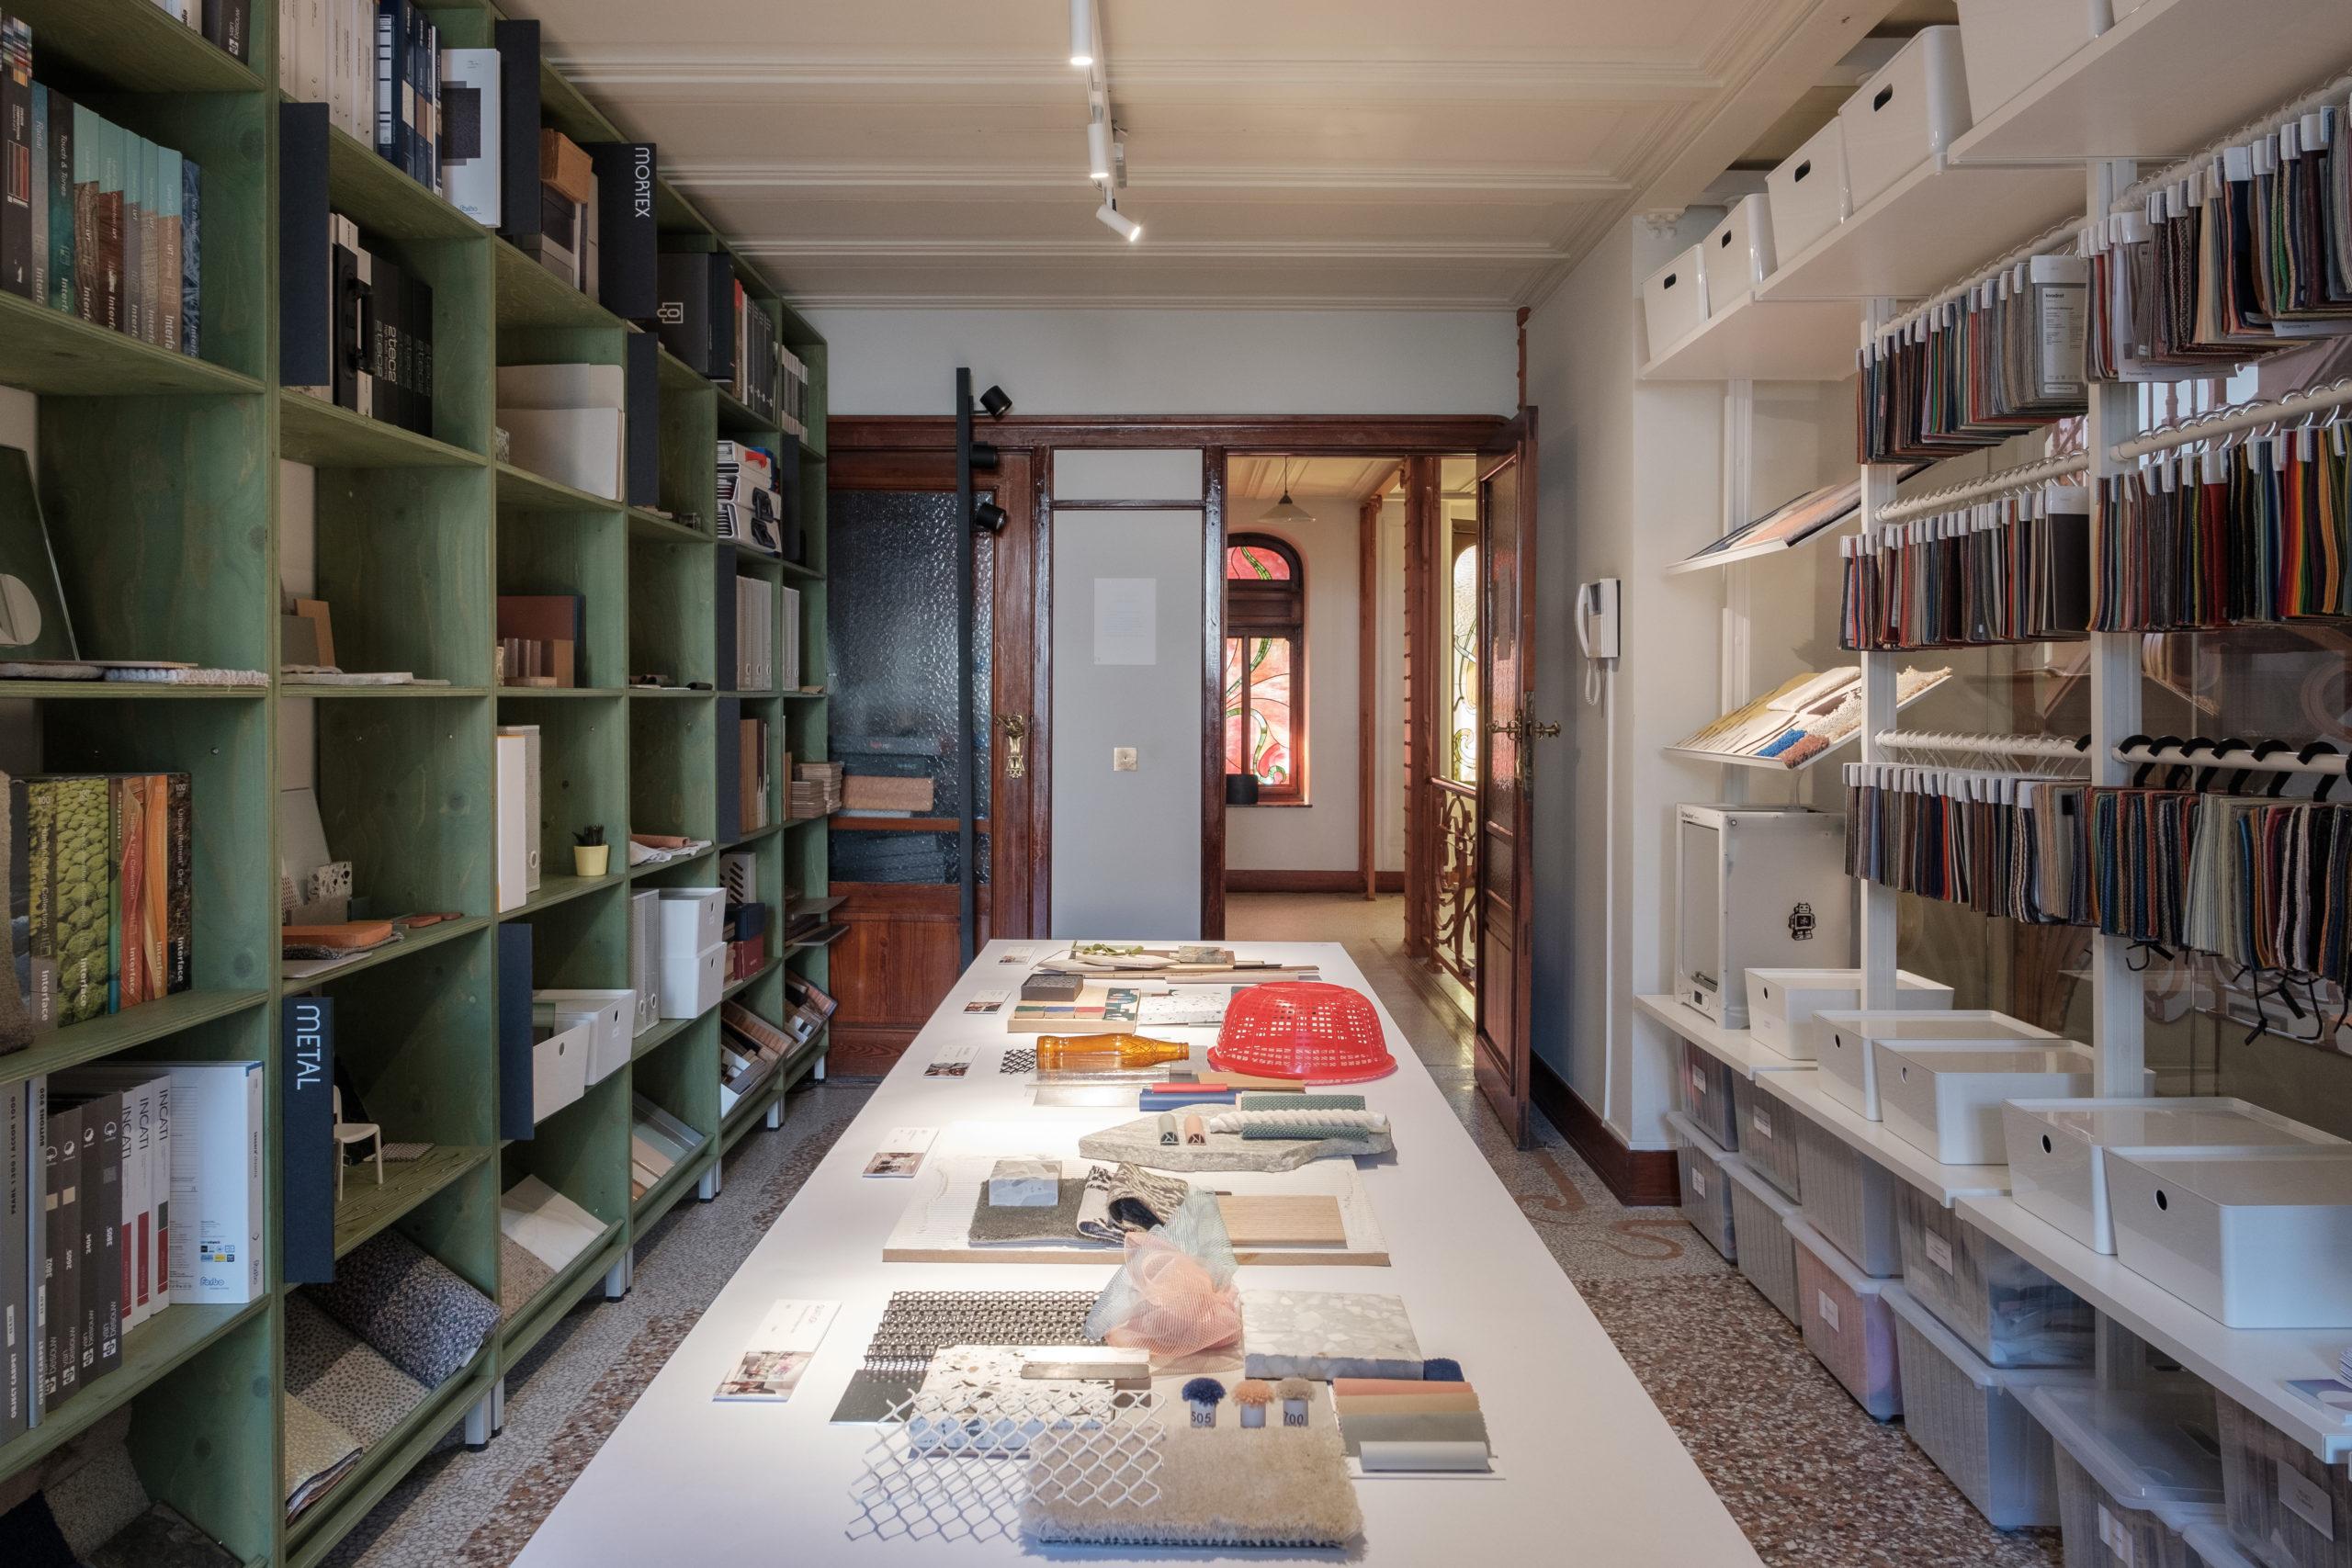 The ncbham library